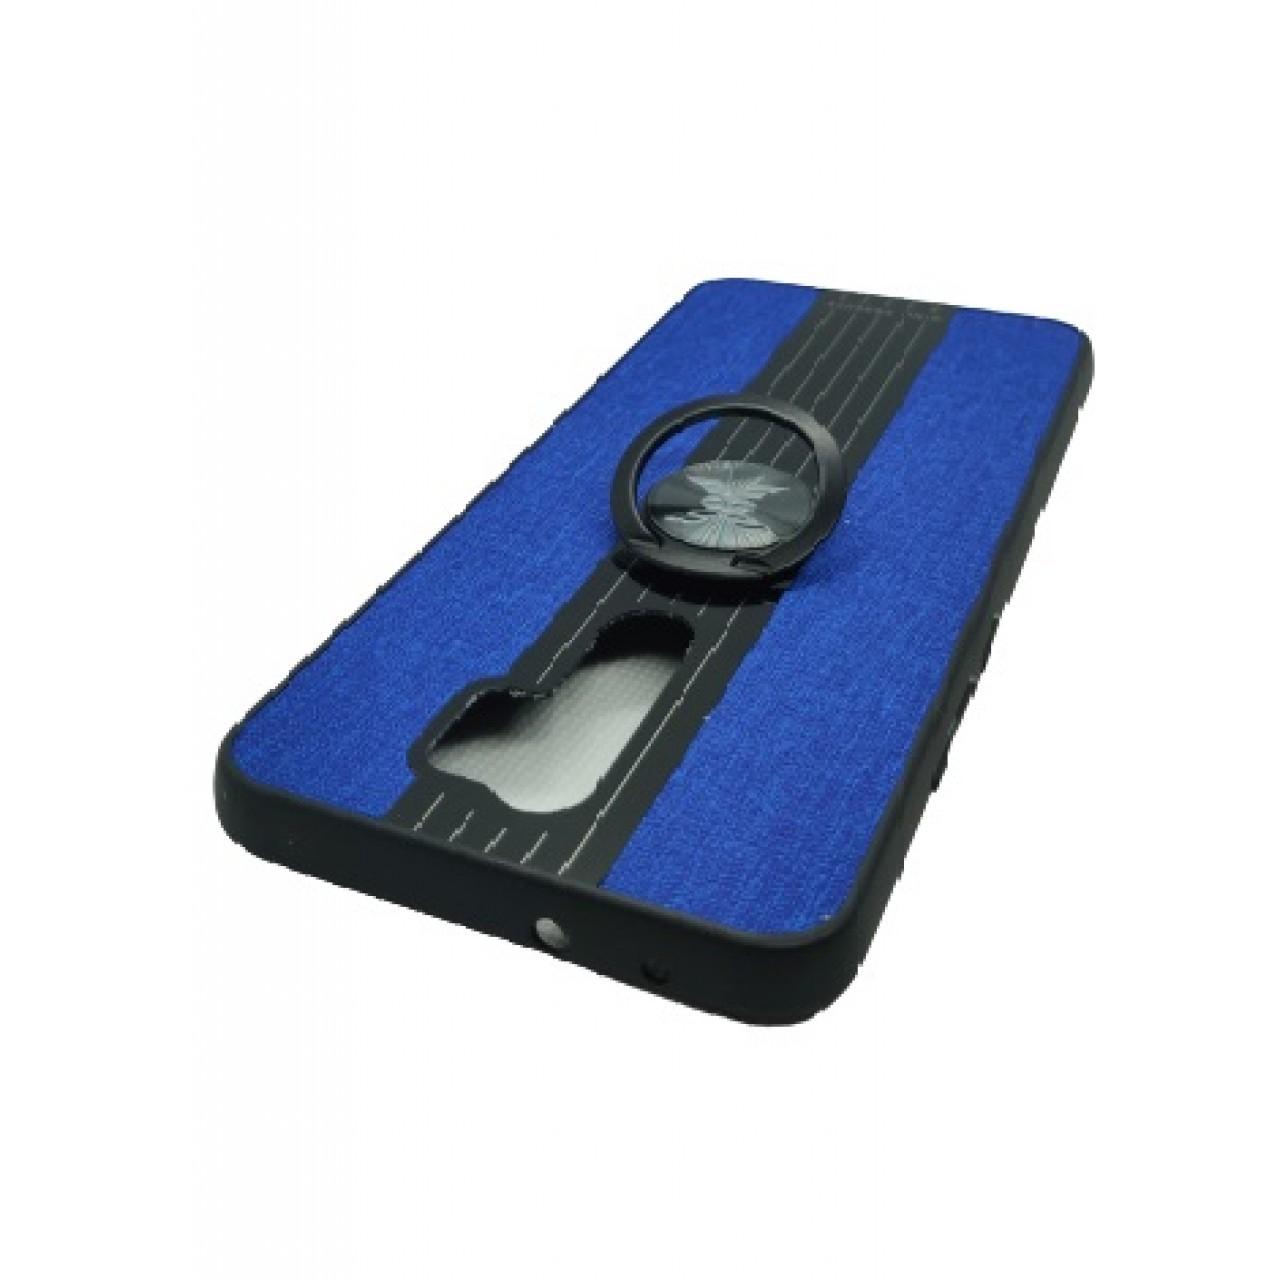 Back Case Cloth Pattern with ring Blue for Redmi 9 - Θήκη προστασίας με δαχτυλίδι στην πλάτη Μπλε - OEM